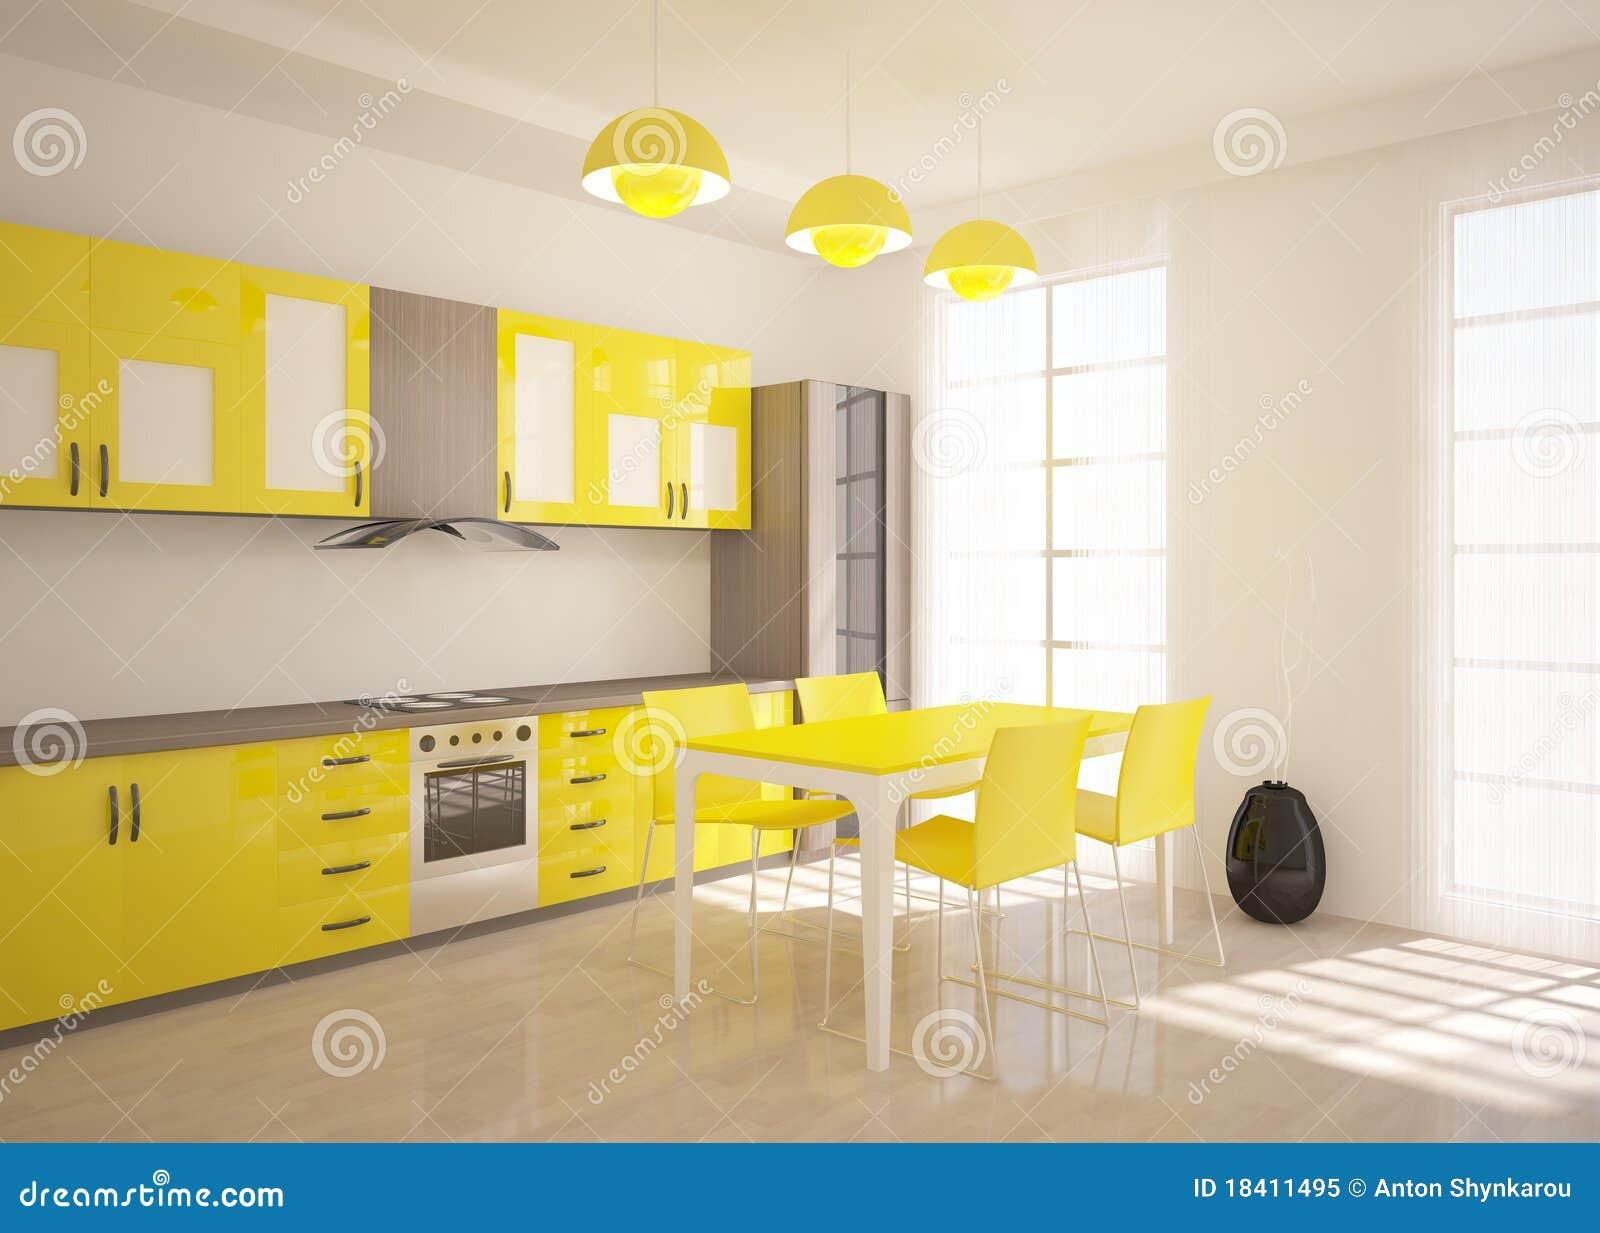 Keuken In Gele : Gele Keuken Royalty-vrije Stock Foto - Afbeelding ...